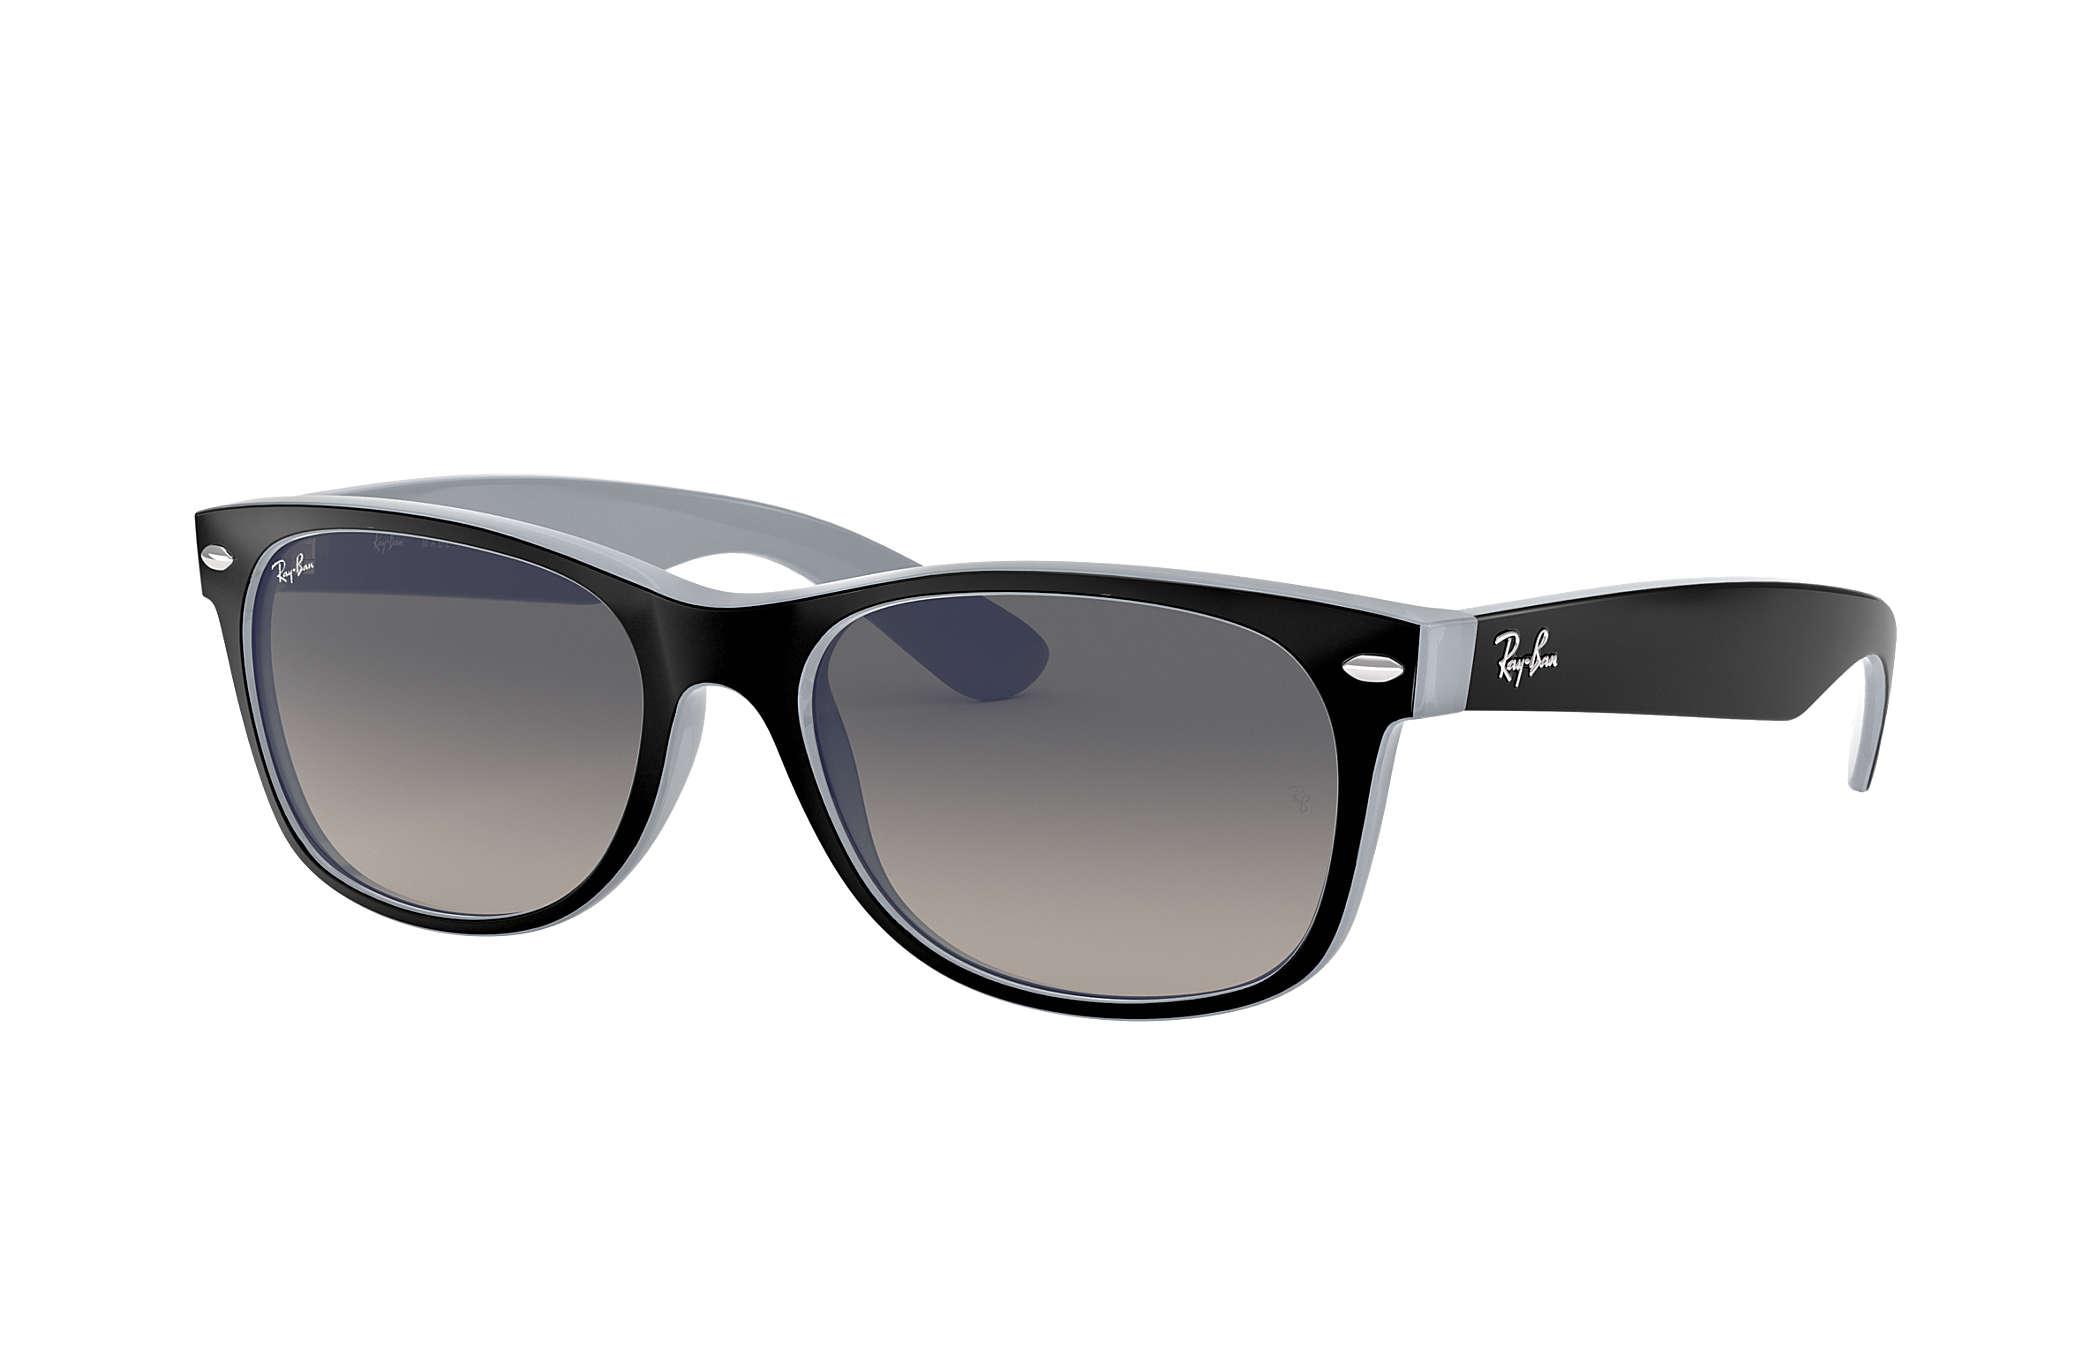 098fb41ee3 Ray-Ban New Wayfarer Color Mix RB2132 Black - Nylon - Grey Lenses ...